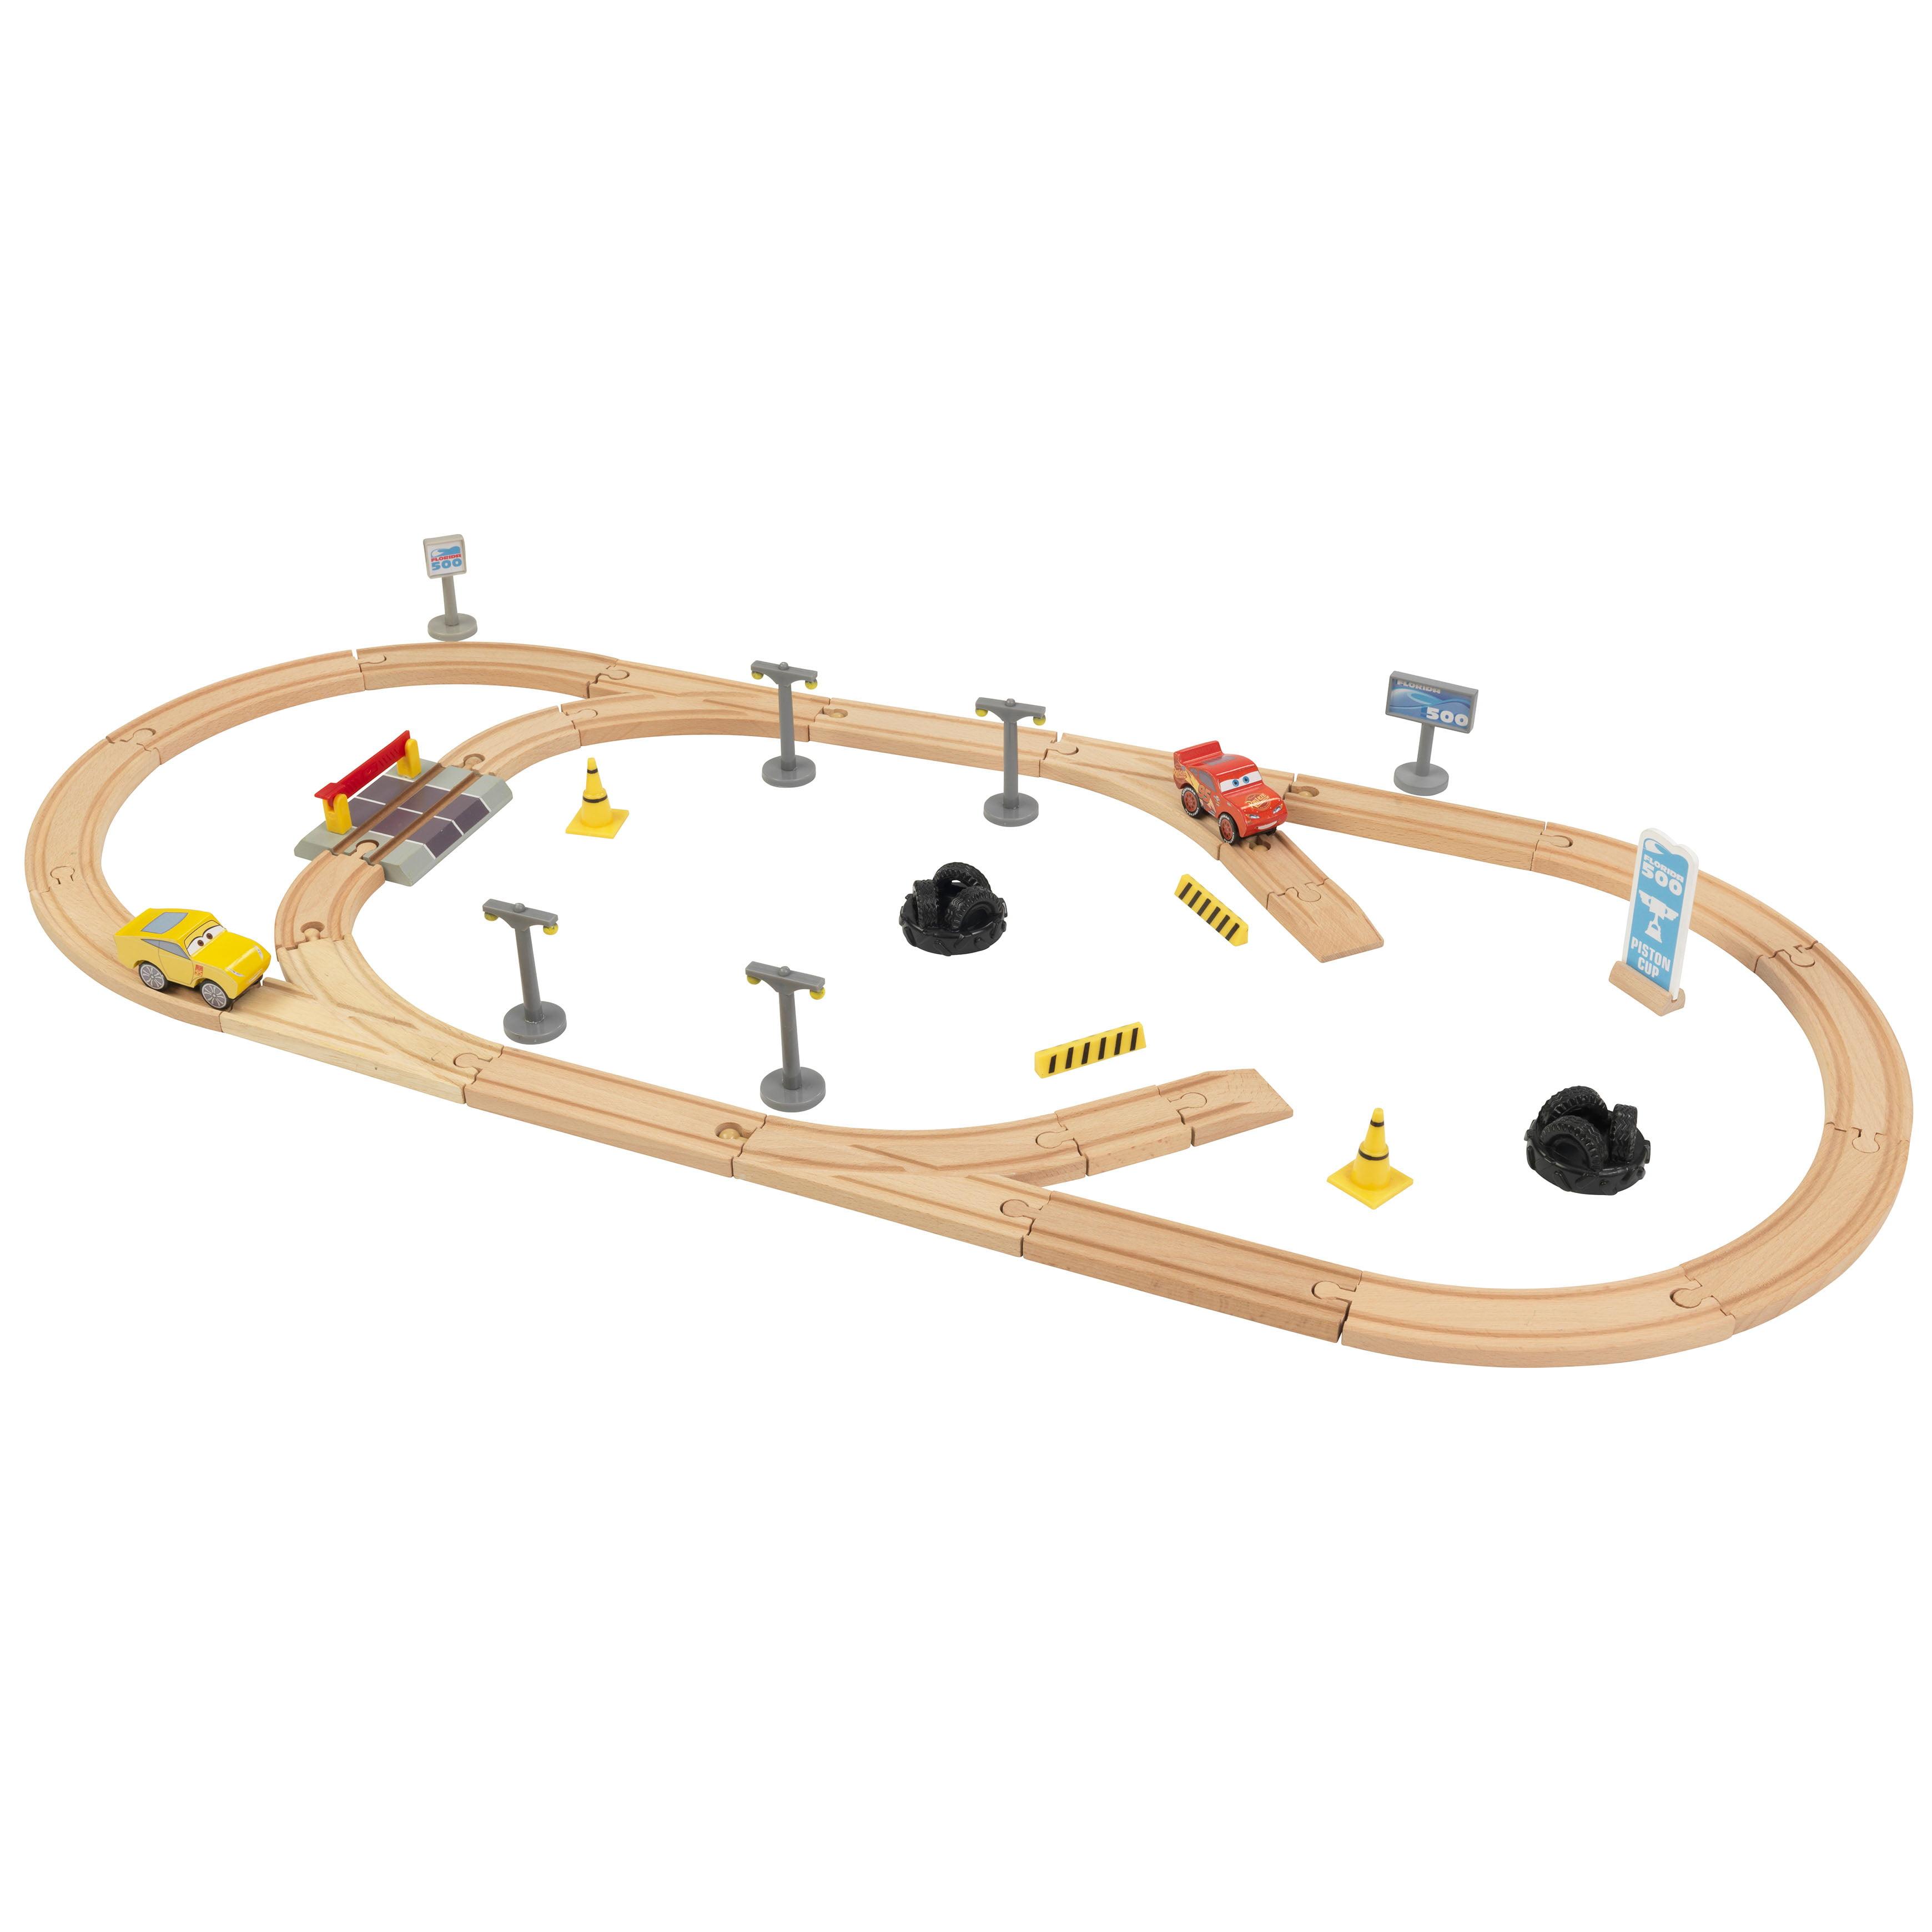 KidKraft Disney Pixar Cars 3 Build Your Own Track Pack by KidKraft